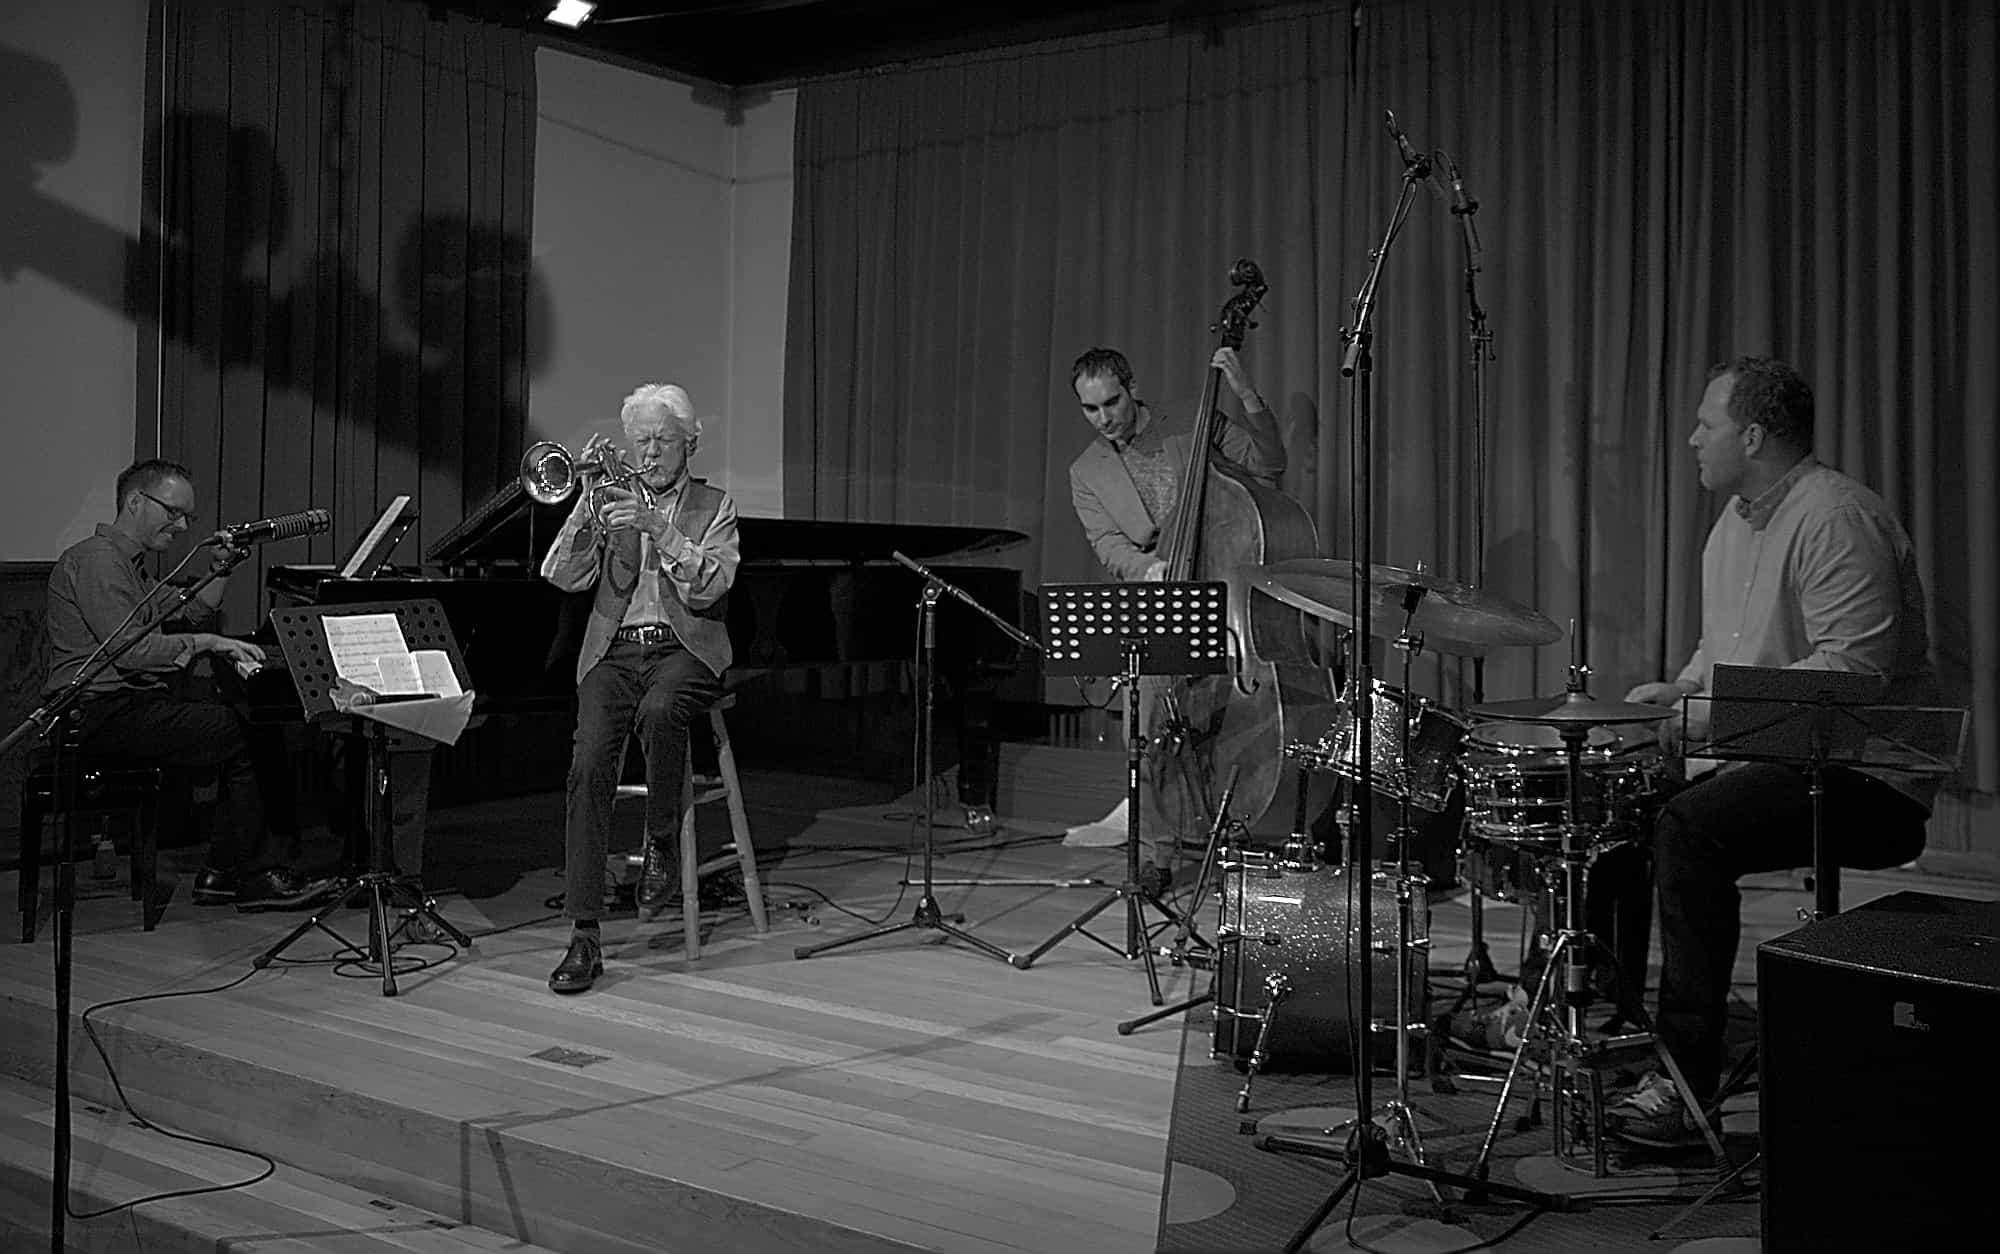 Hochzeitsband Aus Wurzburg Jazz Band Piano Trio Triority